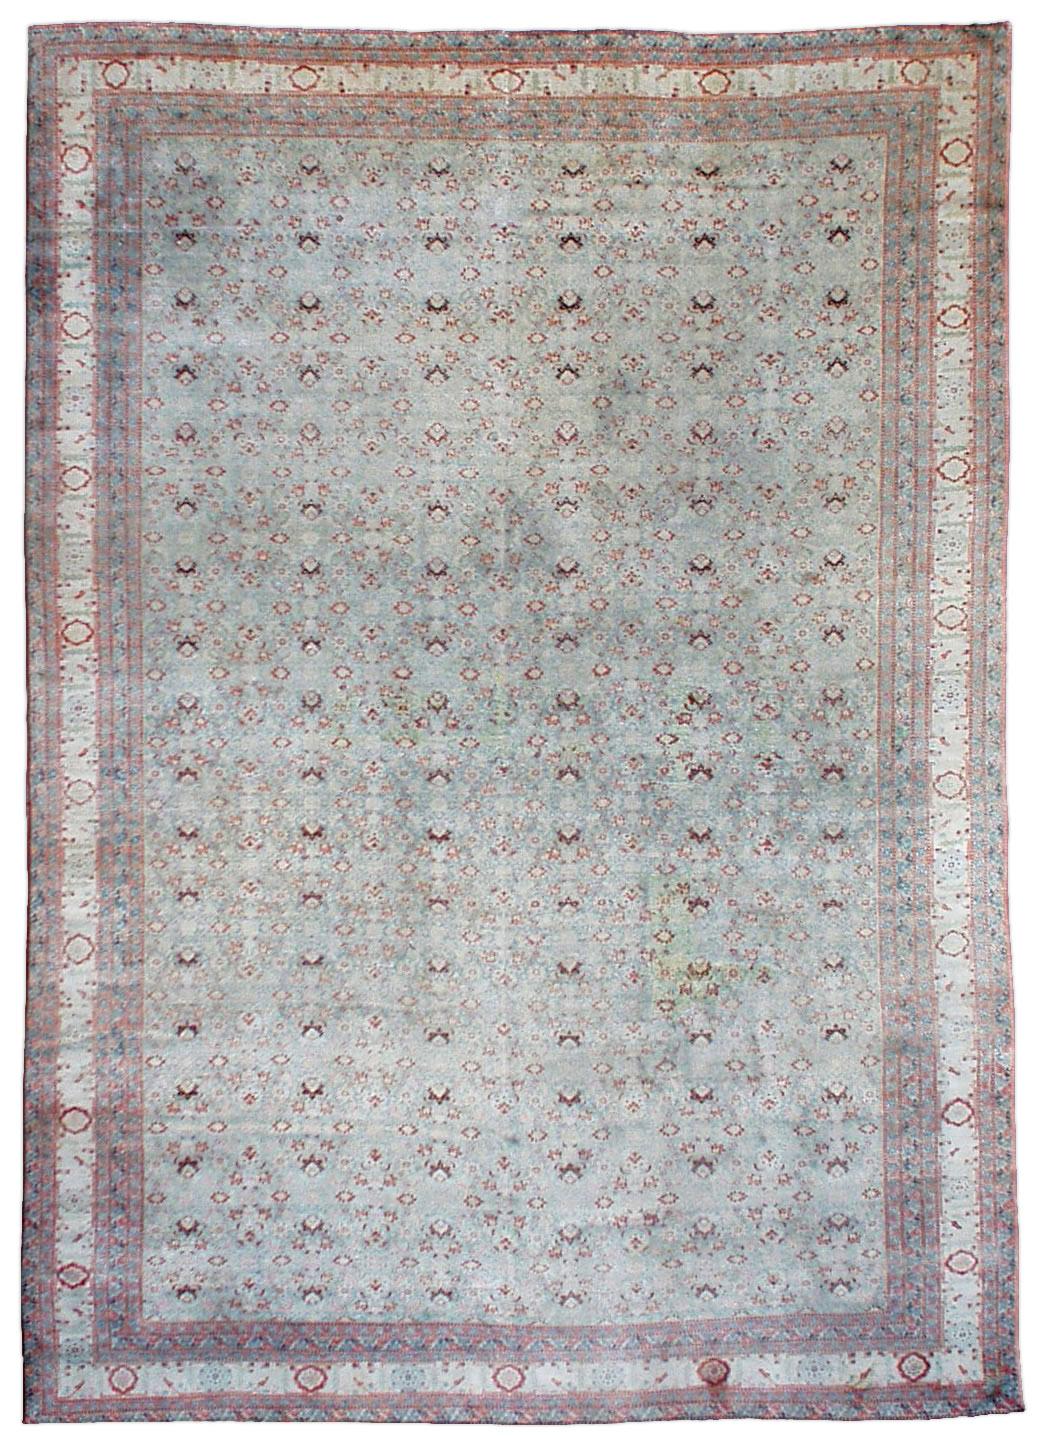 Vintage Persian Tabriz Rug BB0993